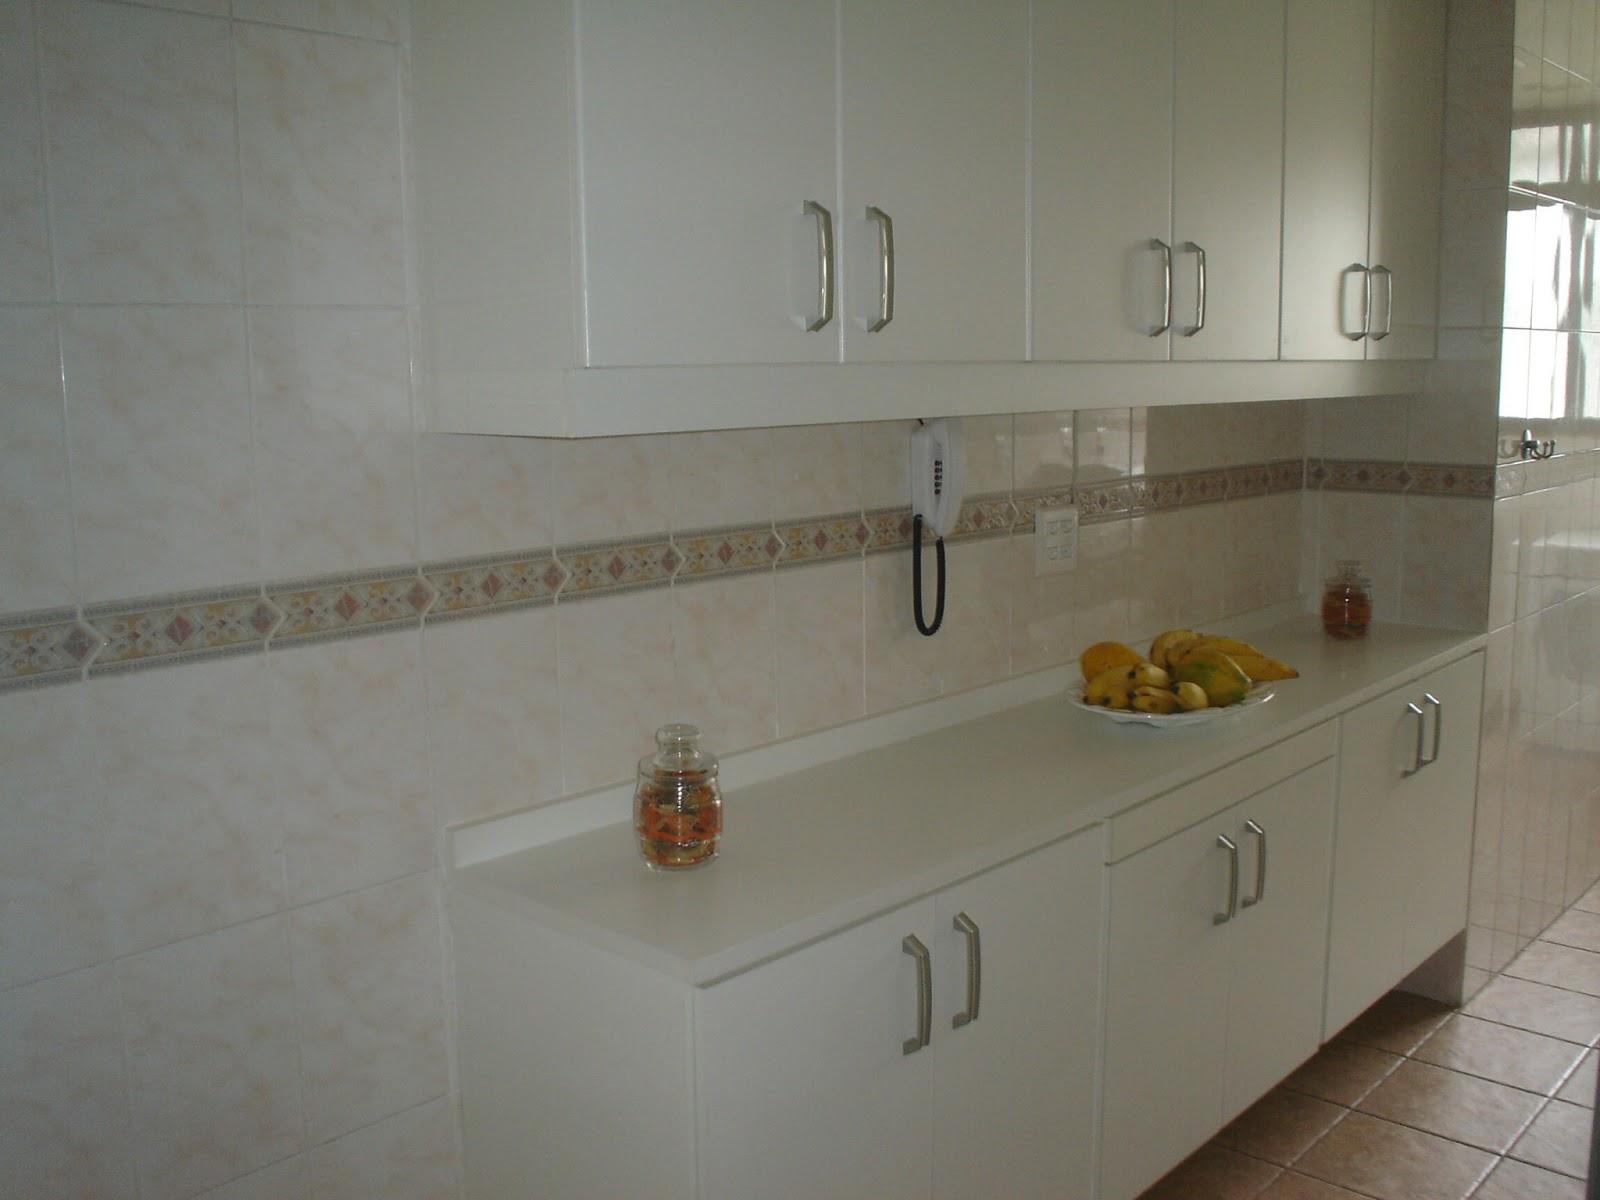 Excelente Apartamento no Recreio dos Bandeirantes RJ: Outubro 2014 #5E4D34 1600x1200 Bancada Banheiro Rj